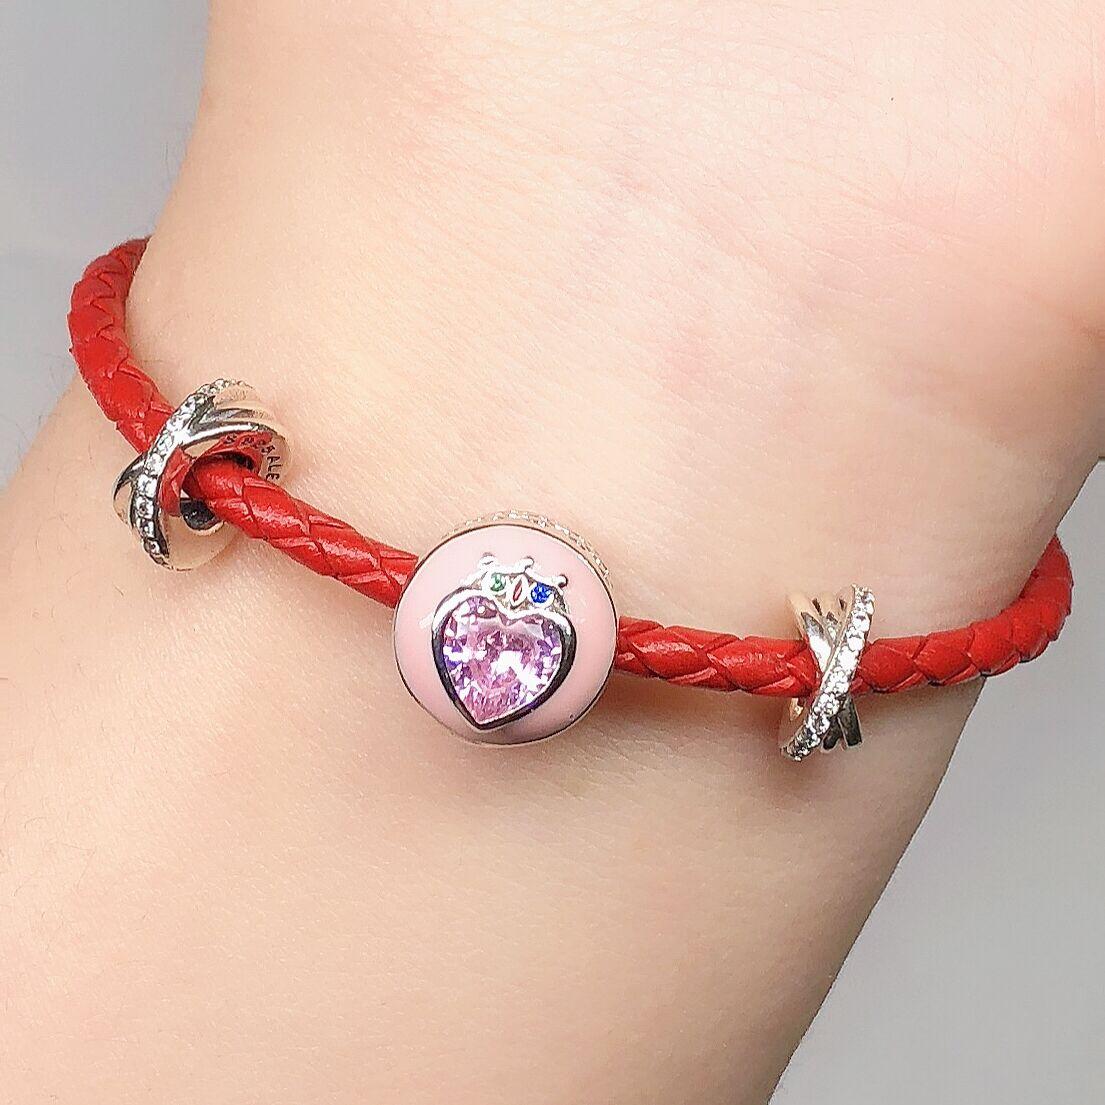 Sailor Moon Zecter Pendant Charm Bead bracelet Beads 925 Silver